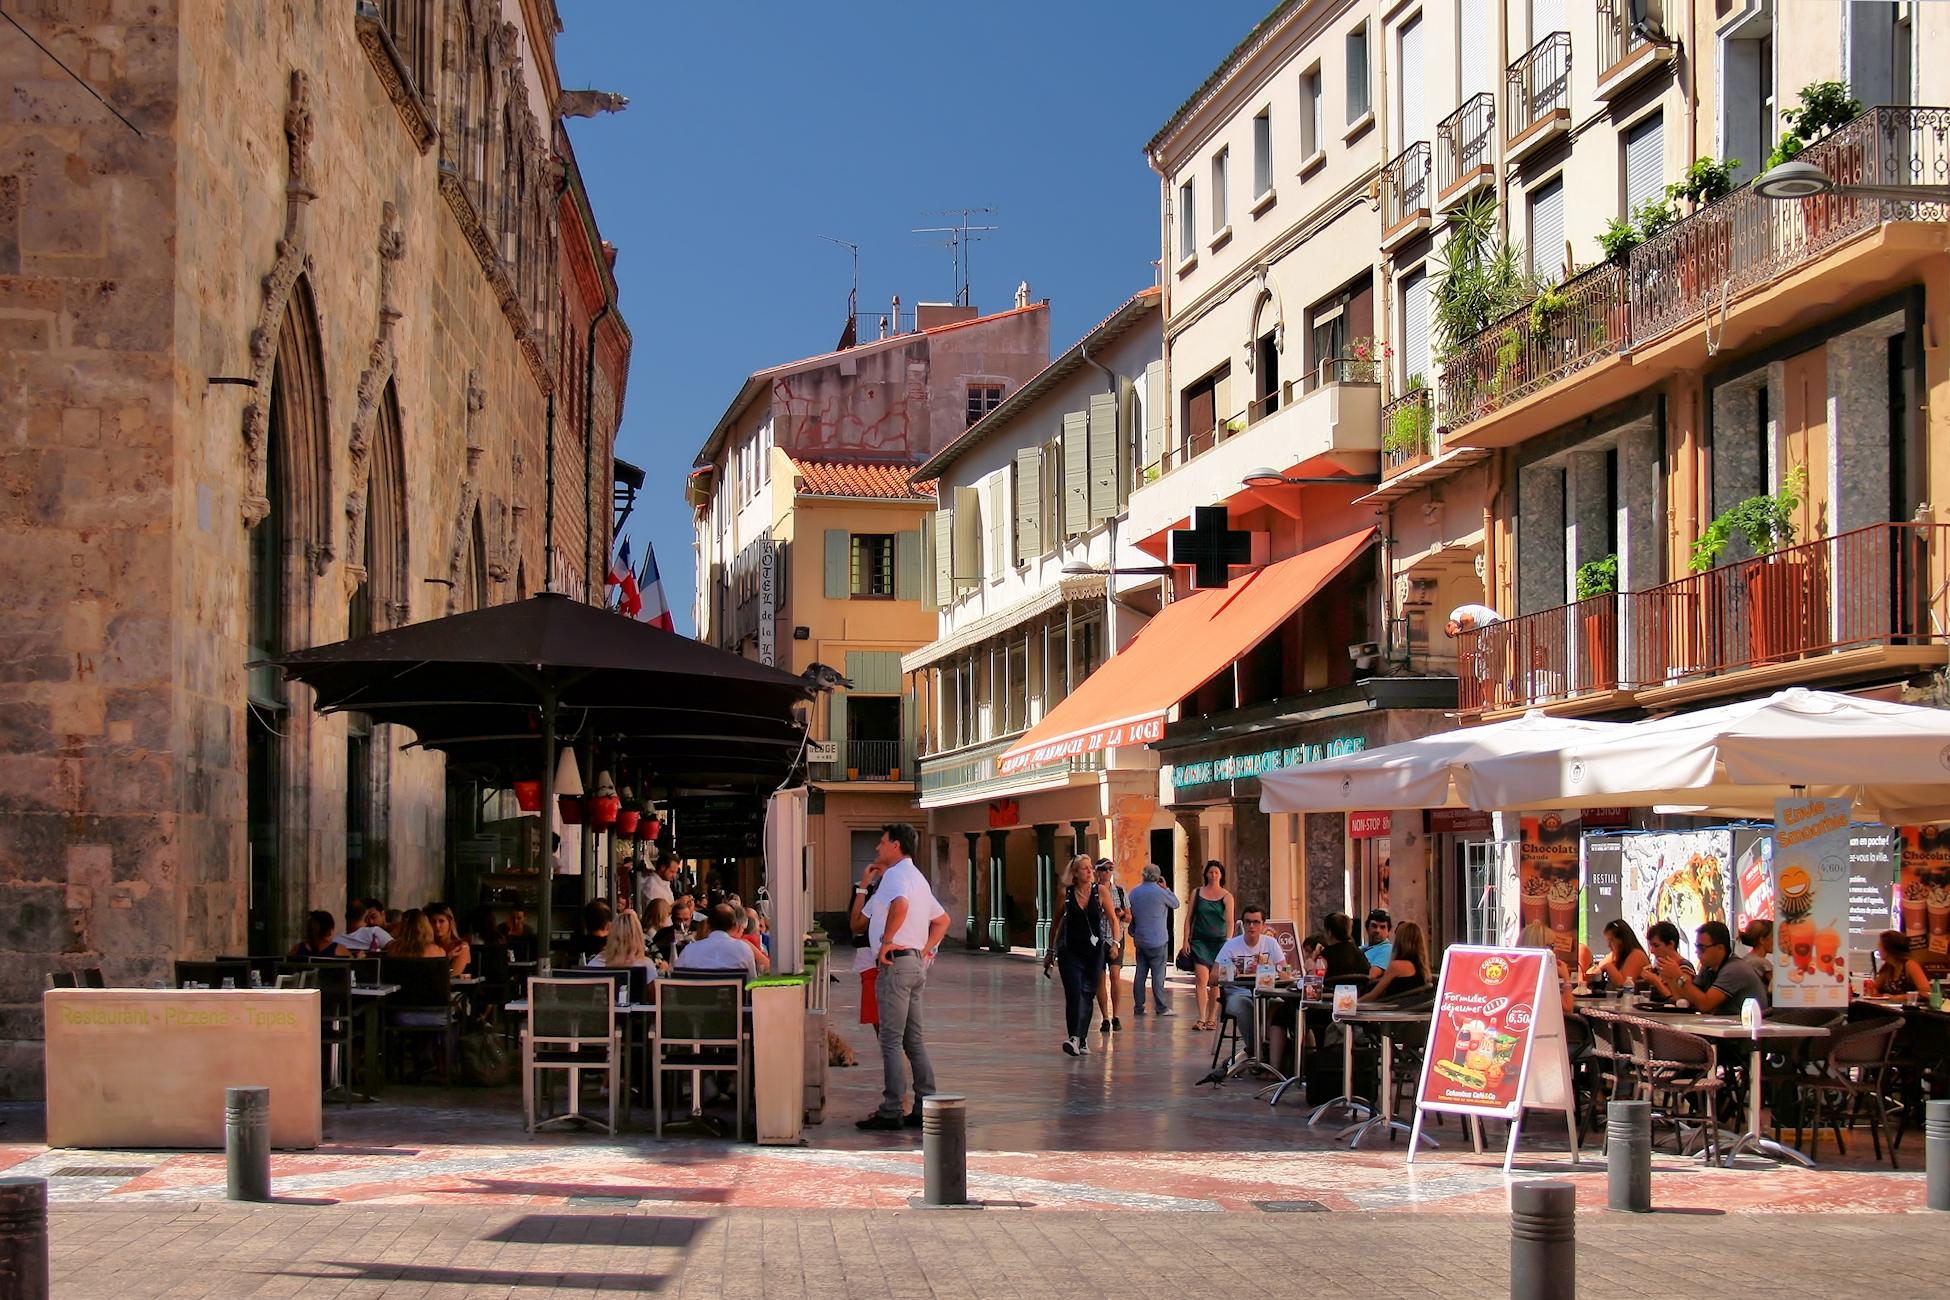 Wine Stay in Roussillon - Roussilon - Roussillon - 2